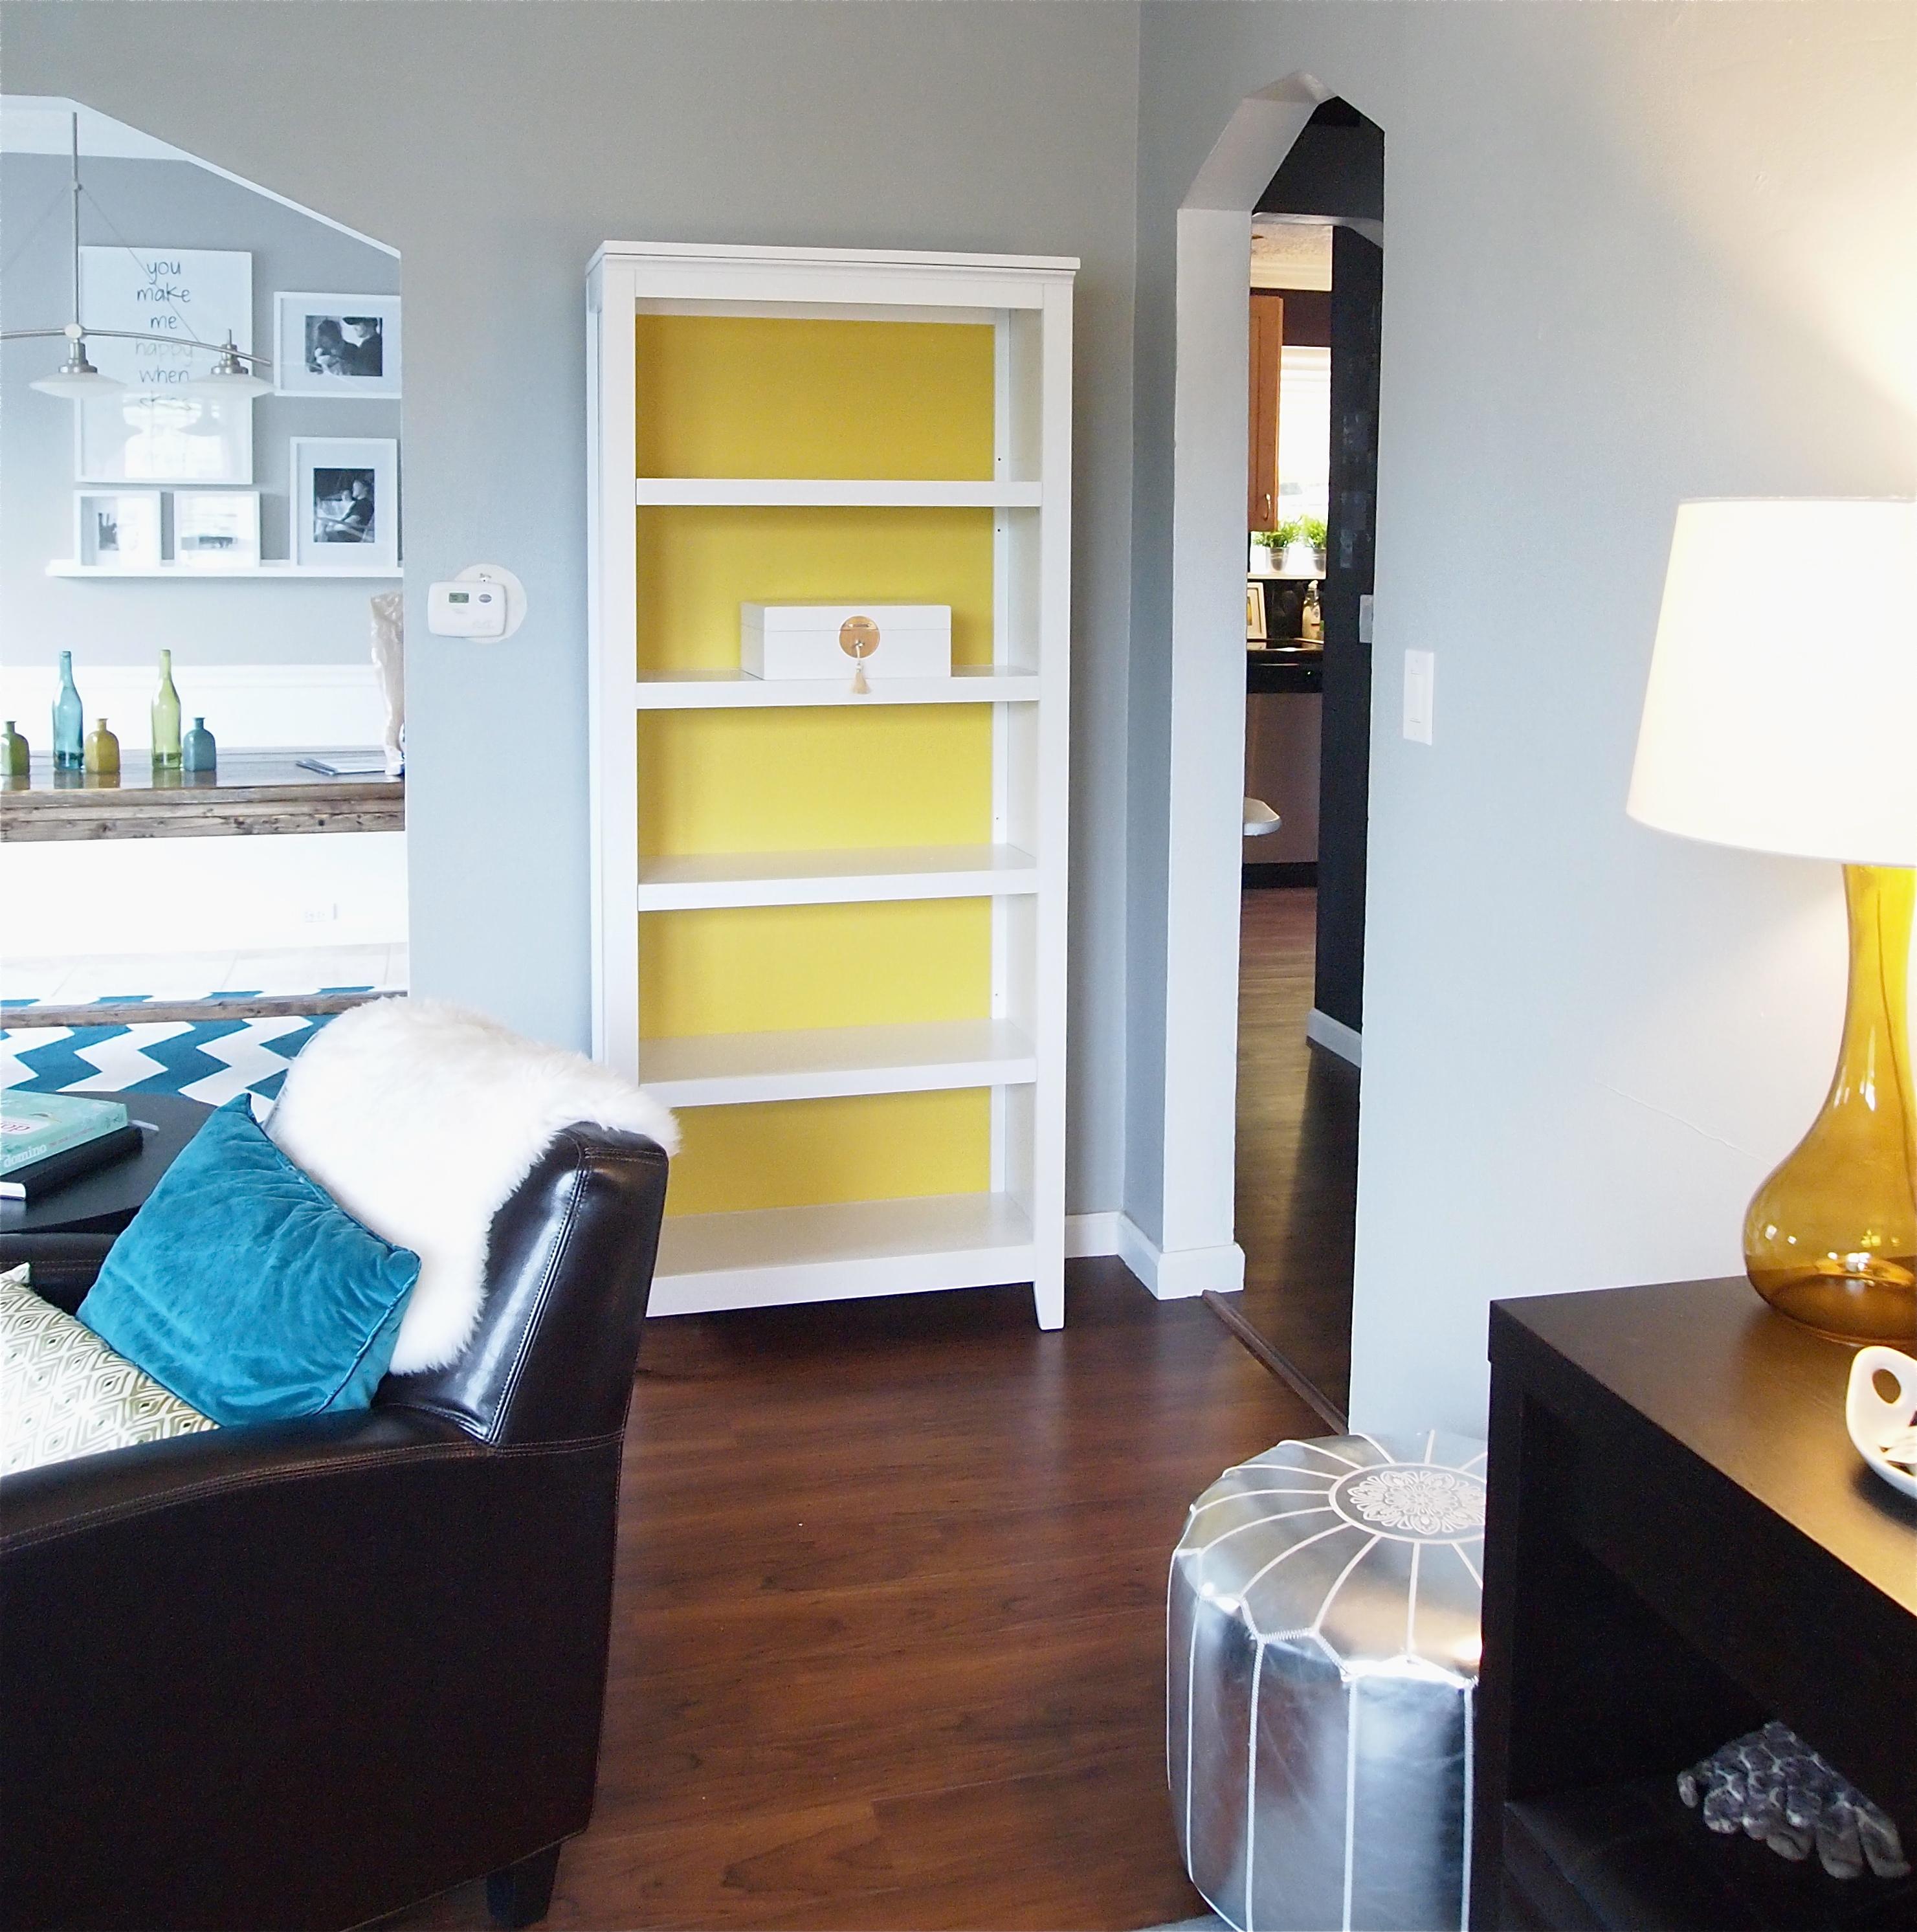 Painted Bookshelf Thrifty Home Design Pertaining To Painted Bookshelf (#10 of 15)